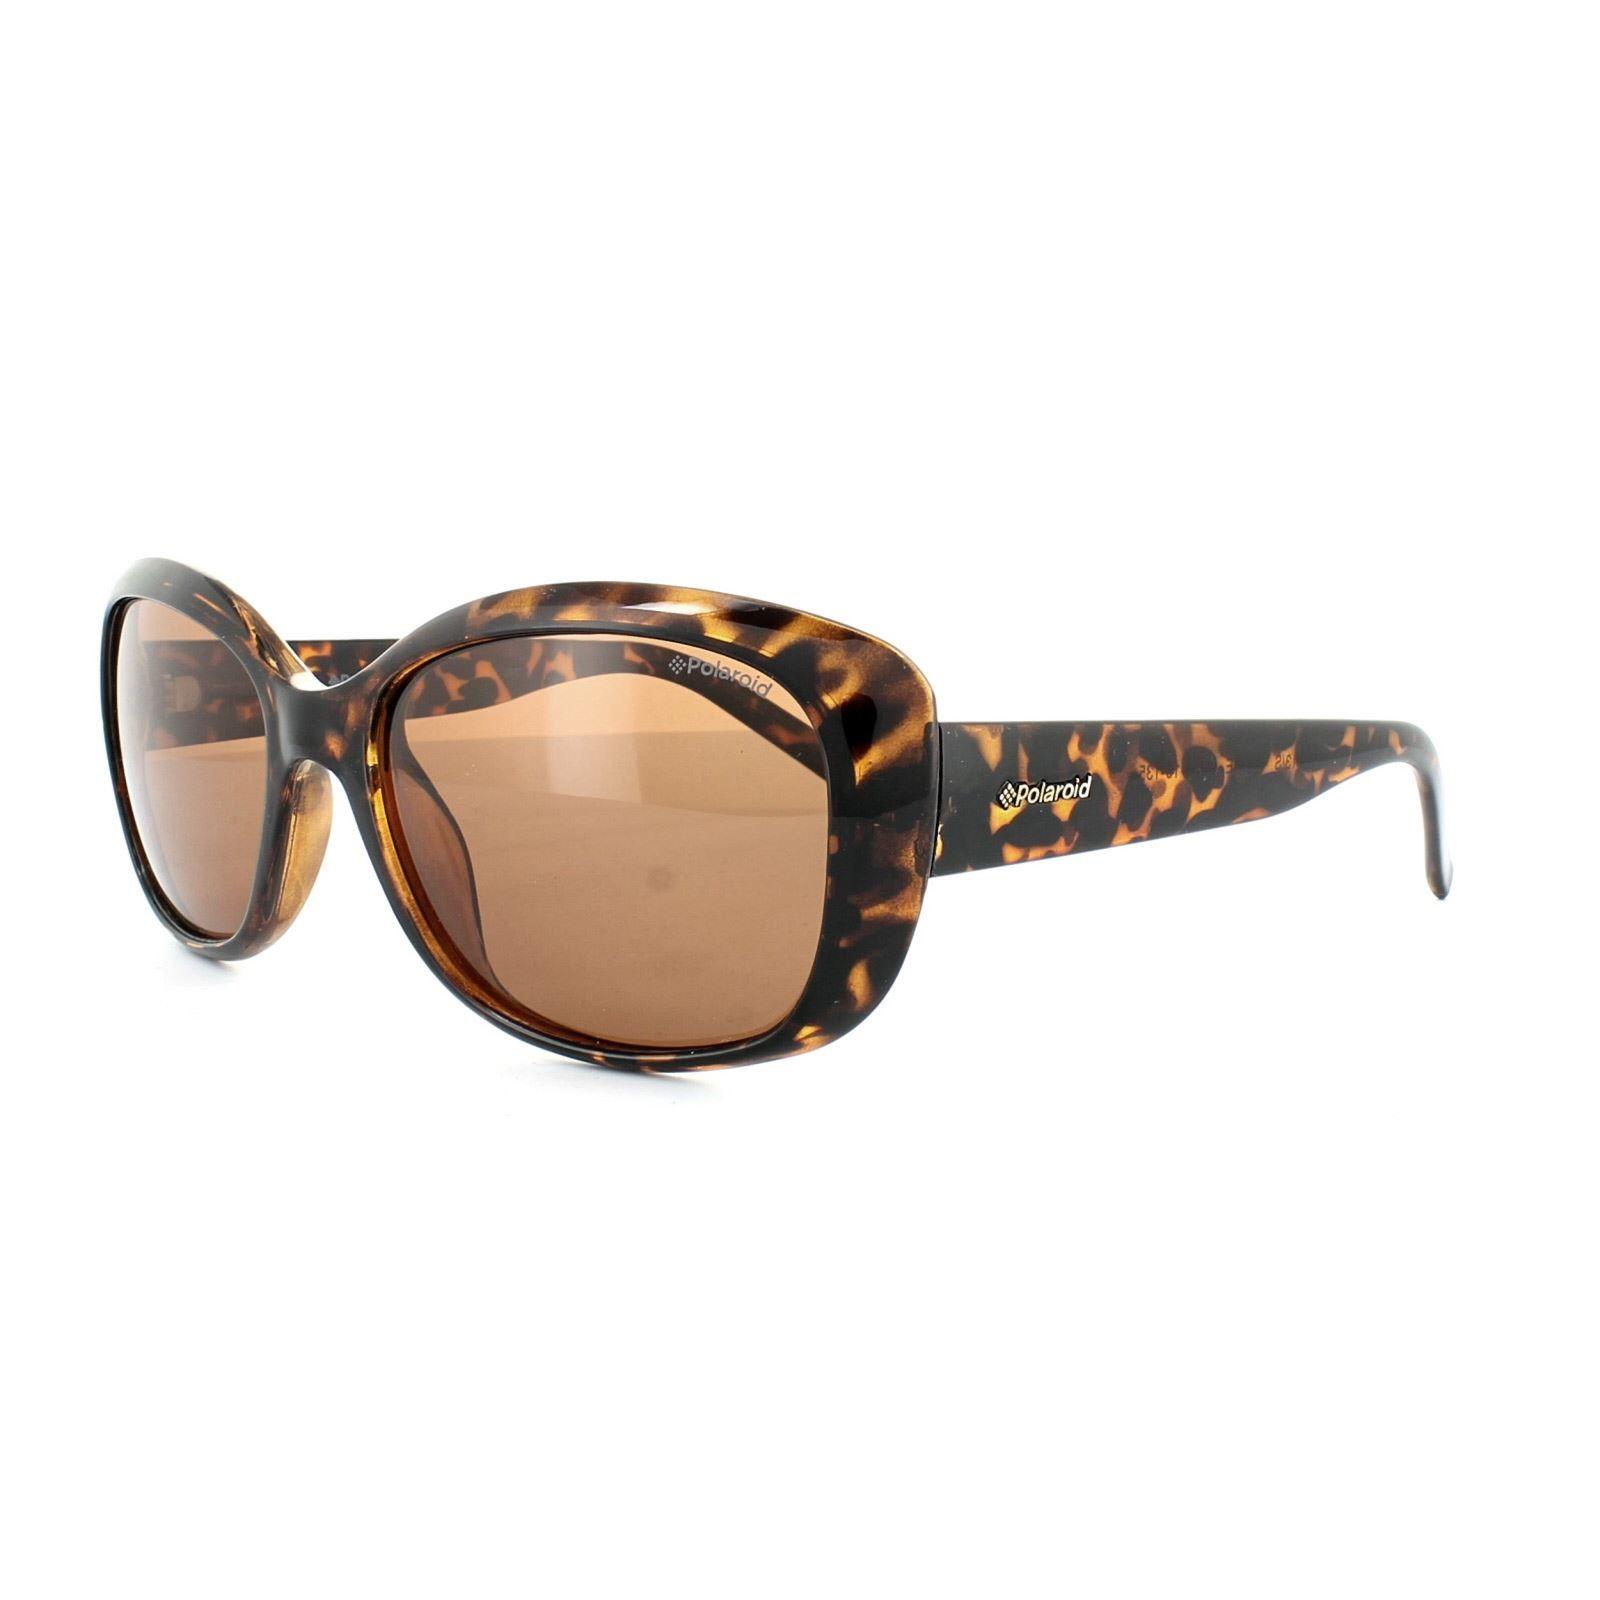 Polaroid Sunglasses 4013/S V08 HE Havana Copper Polarized